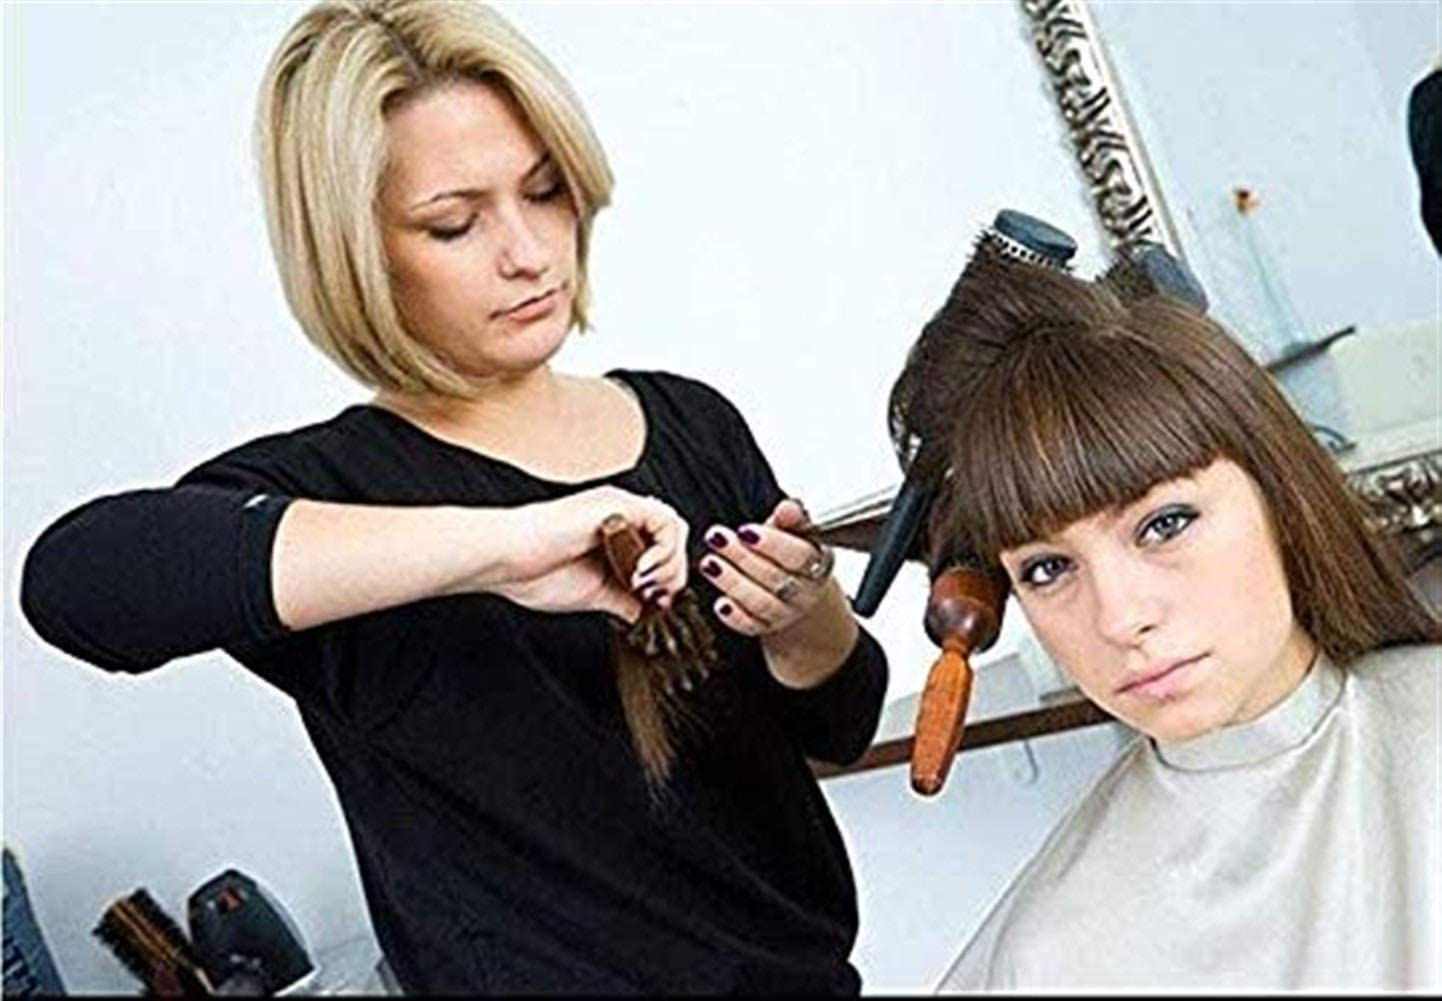 90cm Hair Salon Logo Waterproof Rotating Light Salon Shop Sign Barber Shop Outdoor Wall Light LED Barbers Pole